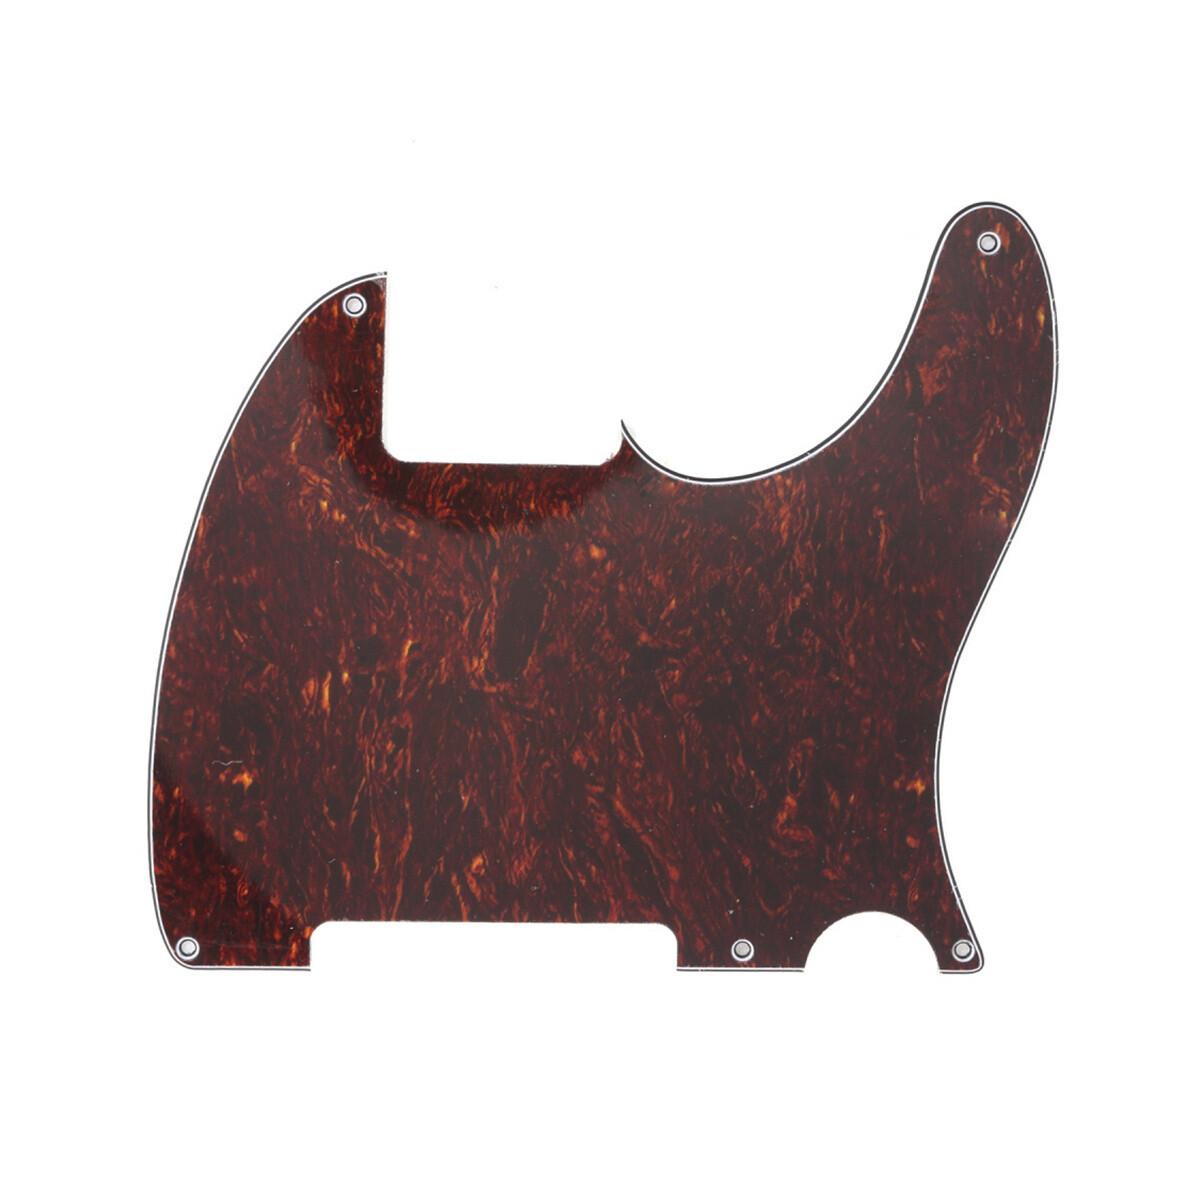 Carparelli Vintage Esquire 5 Hole Tele® Pickguard RH 4 Ply Red Tortoise